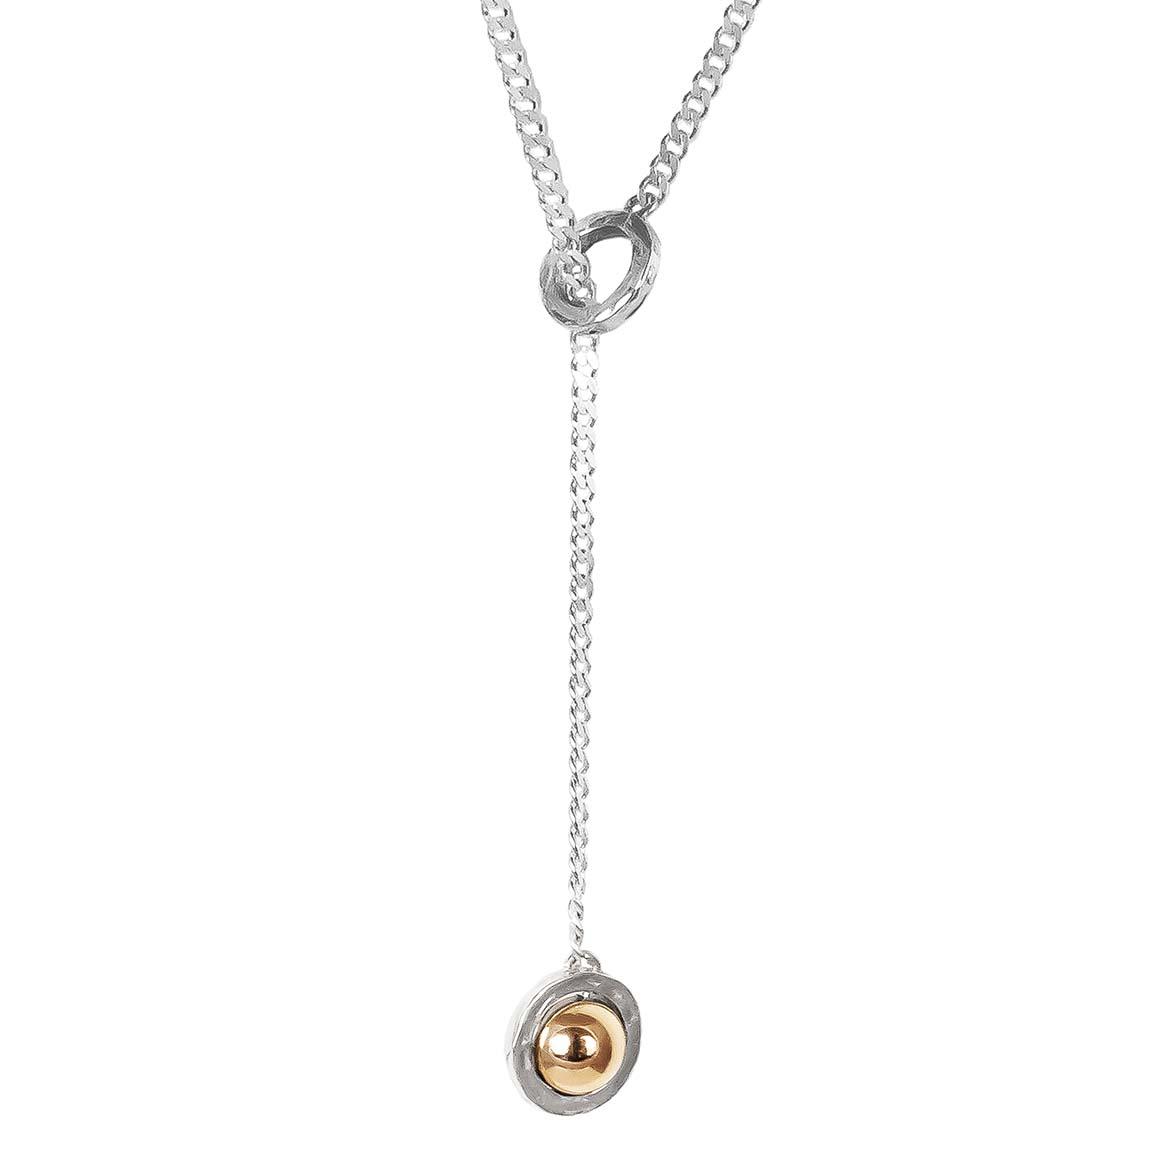 Atticus Large Charm Lariet Necklace | Polished Rose Detail | Trada Marketplace